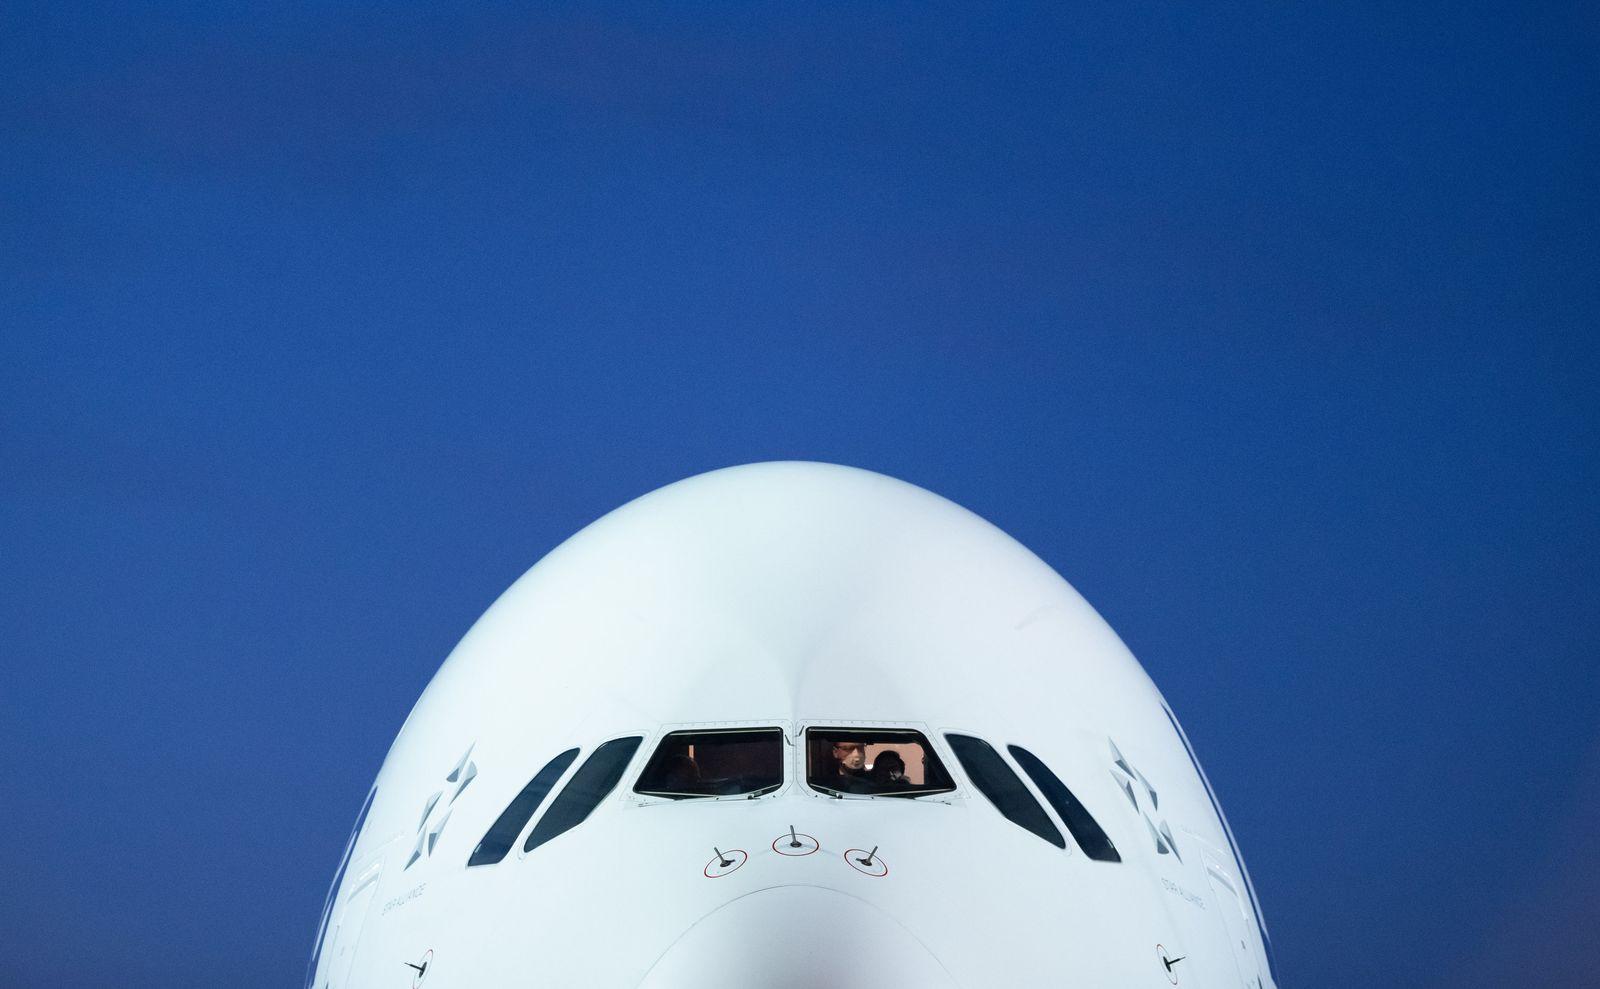 Coronavirus / Lufthansa / Flughafen Frankfurt / Airbus A380